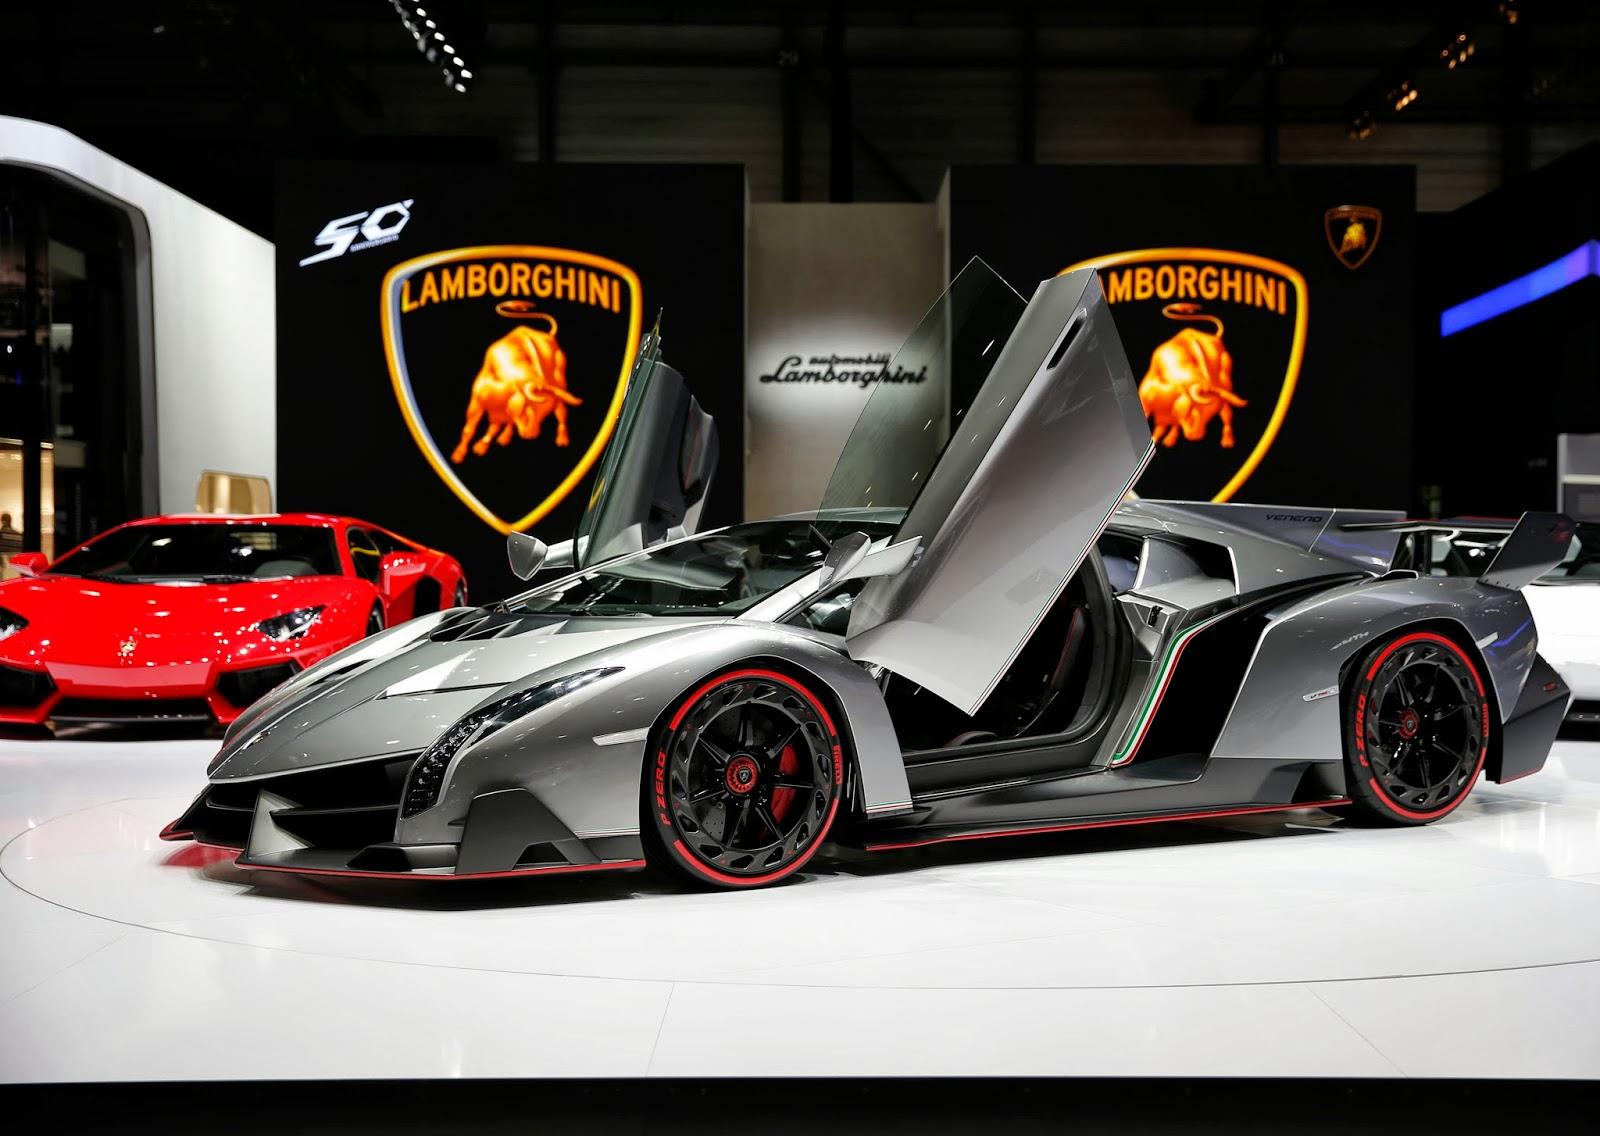 3D wallpapers: Lamborghini wallpapers - Full HD ...